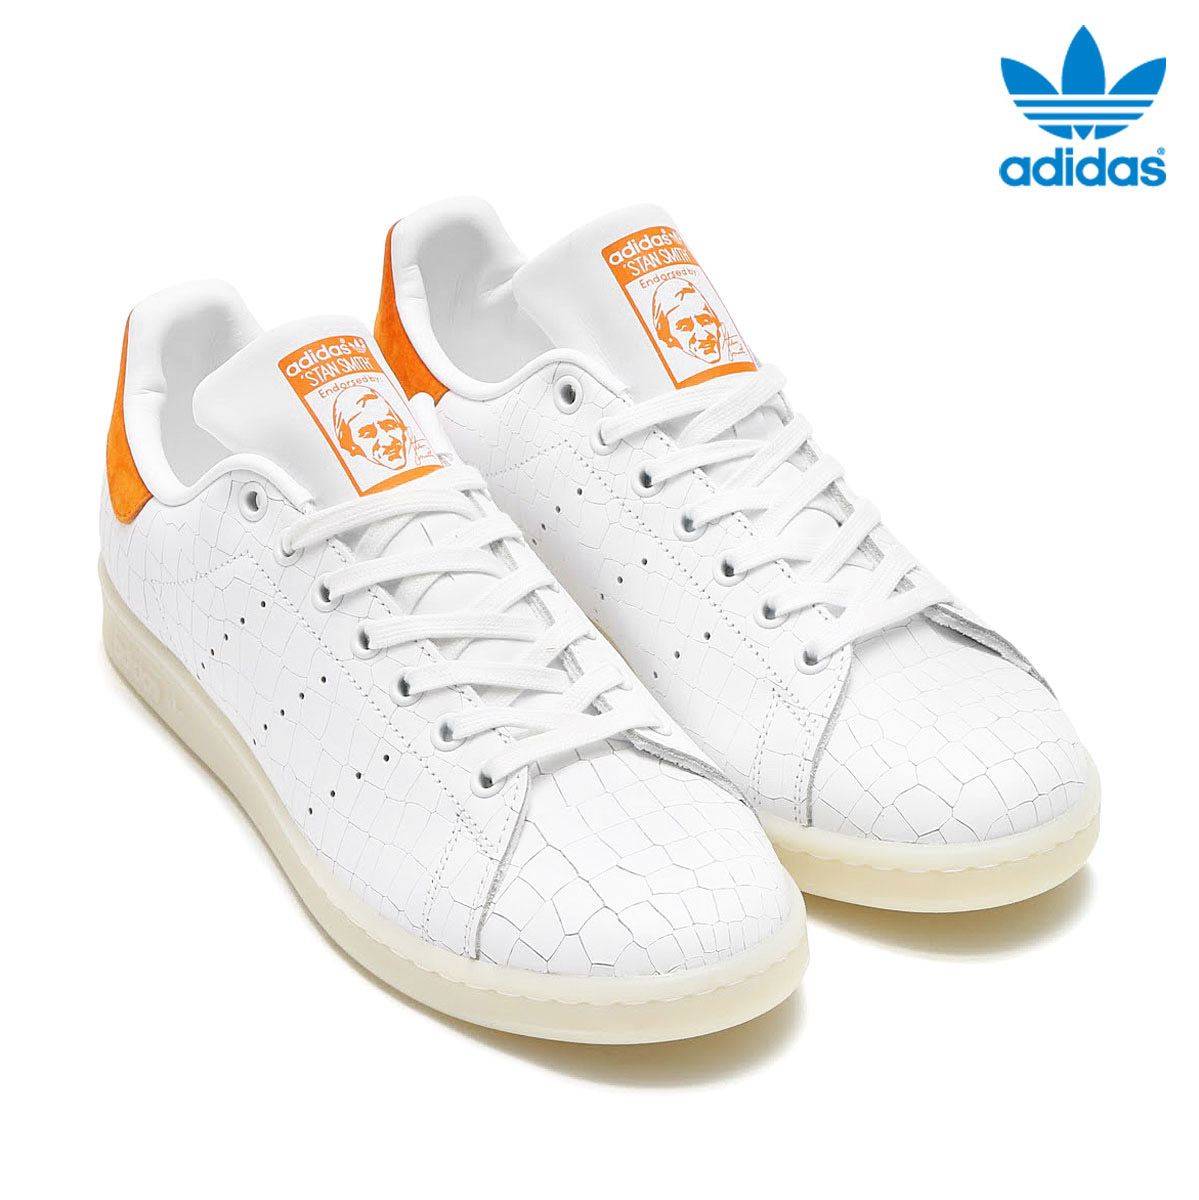 adidas Originals STAN SMITH (アディダス オリジナルス スタンスミス) RUNNING WHITE/RUNNING WHITE/TACTILE ORANGE【メンズ レディース スニーカー】17SS-I